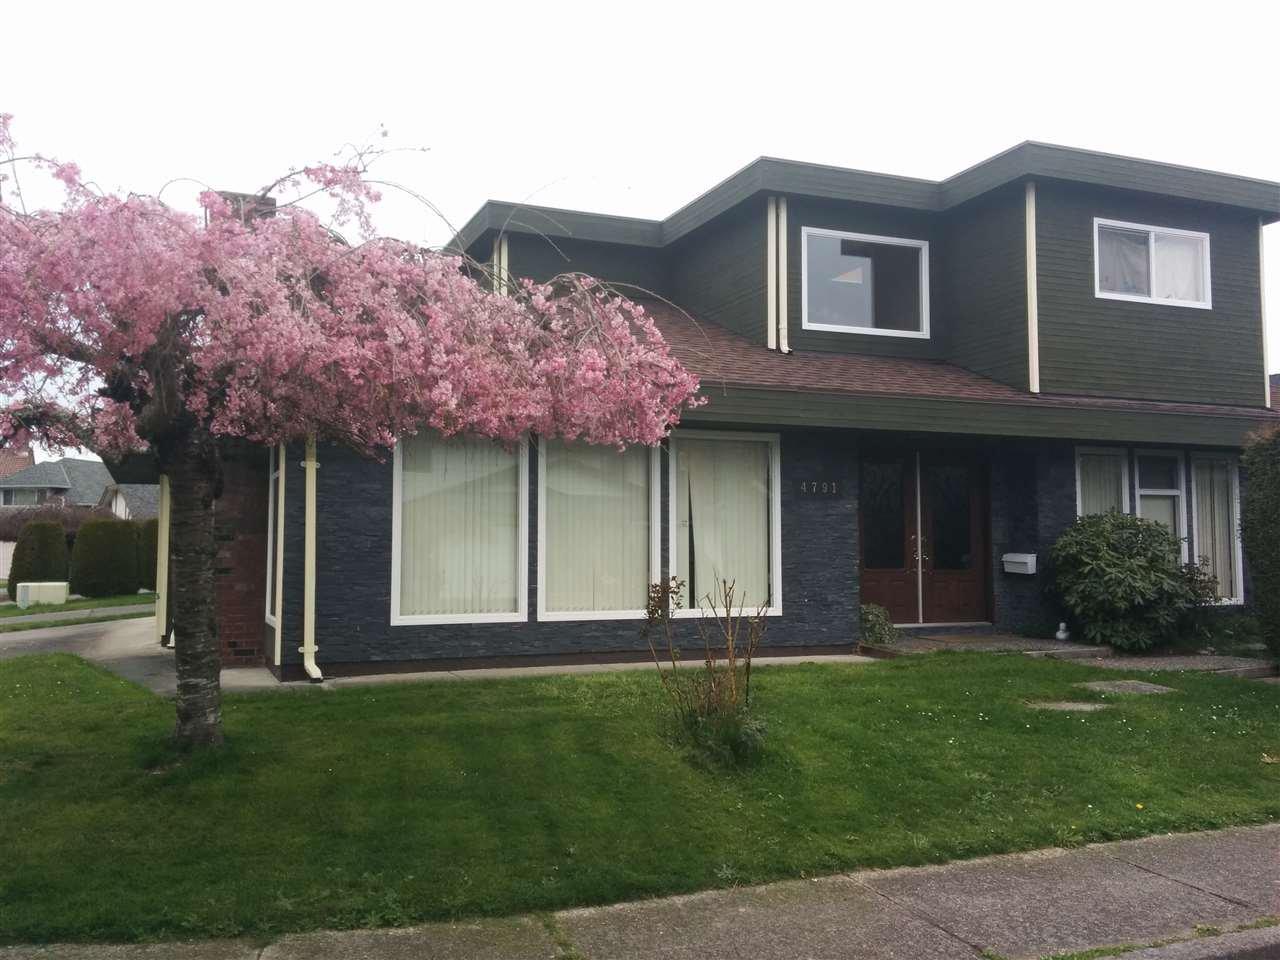 Main Photo: 4791 GROAT AVENUE in : Boyd Park House for sale : MLS®# R2138913